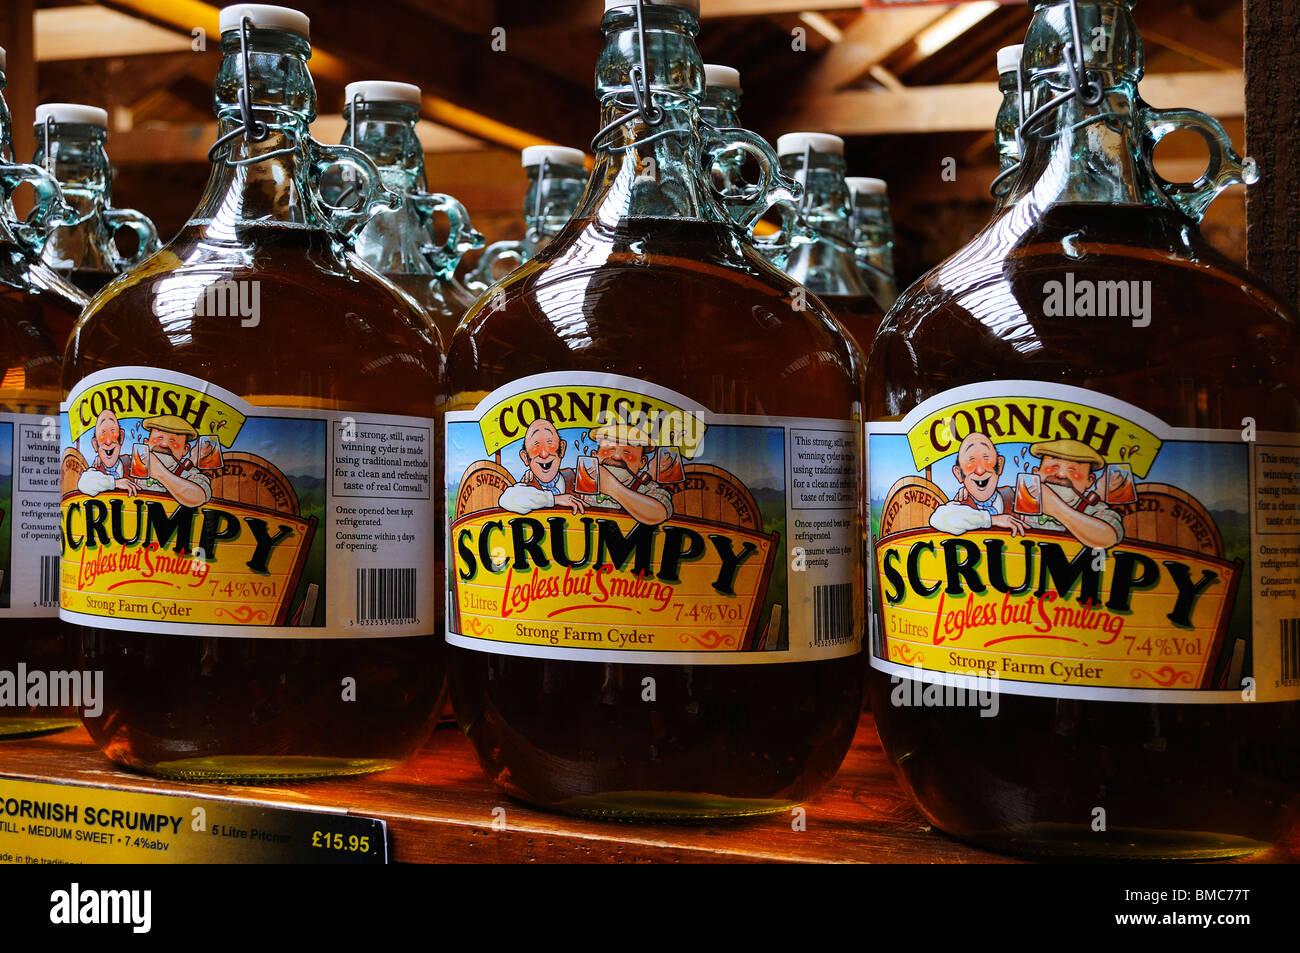 flagons of cornish scrumpy cider in a farm shop near truro,cornwall,uk Stock Photo